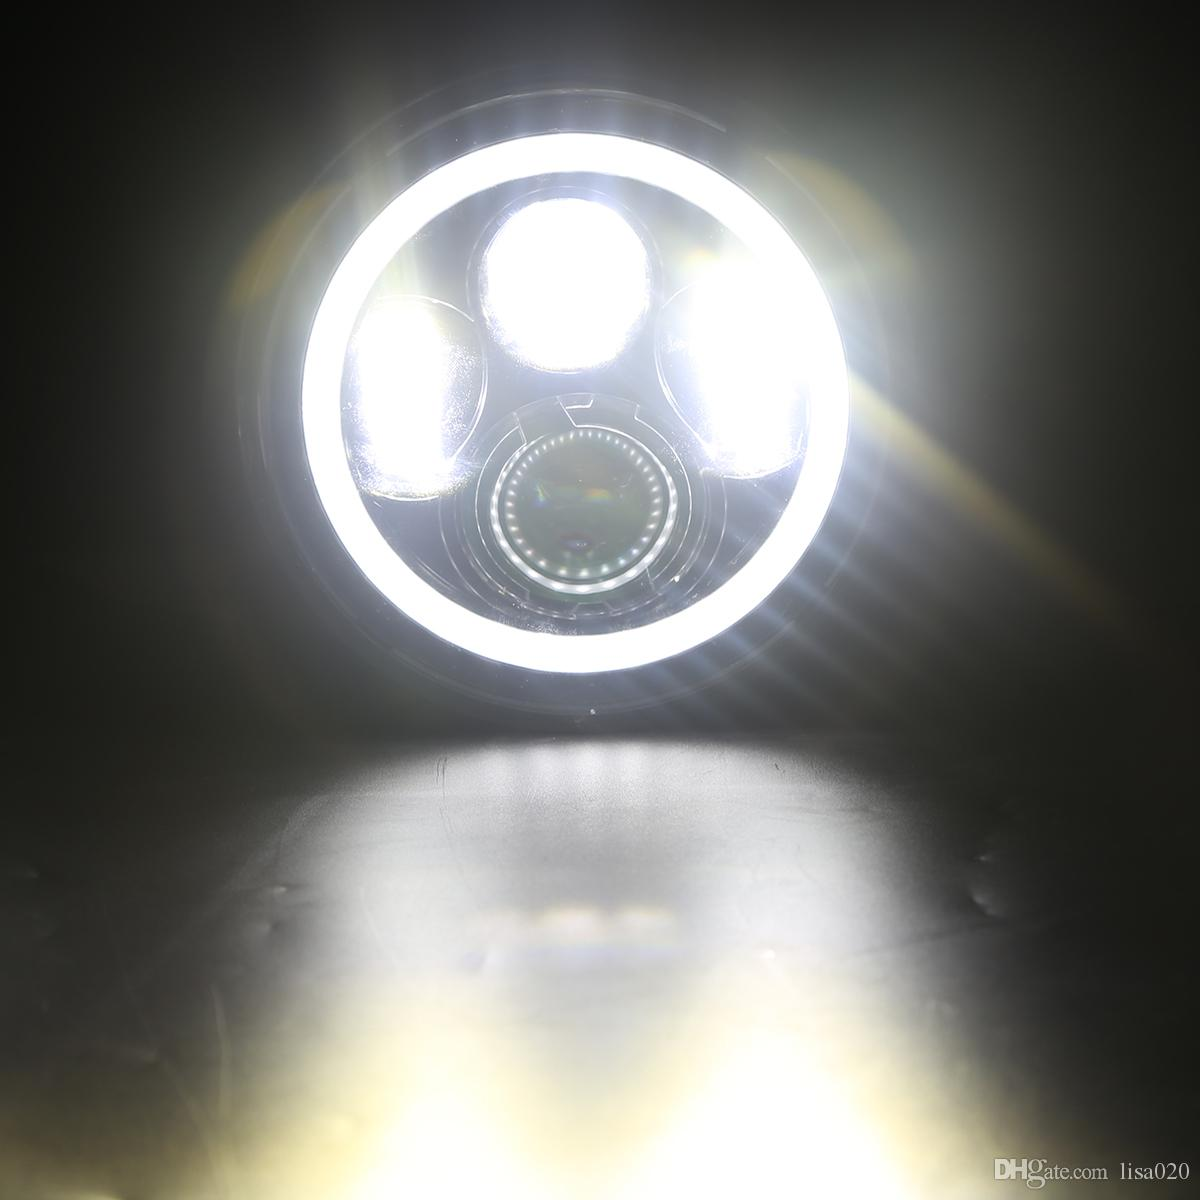 7 Inch Jeep Led Headlamps High Low Beam White Daytime Running Lights Fog Light Plug Angel Eyes The Original Car 2017 New Wholesa Wrangler Online With